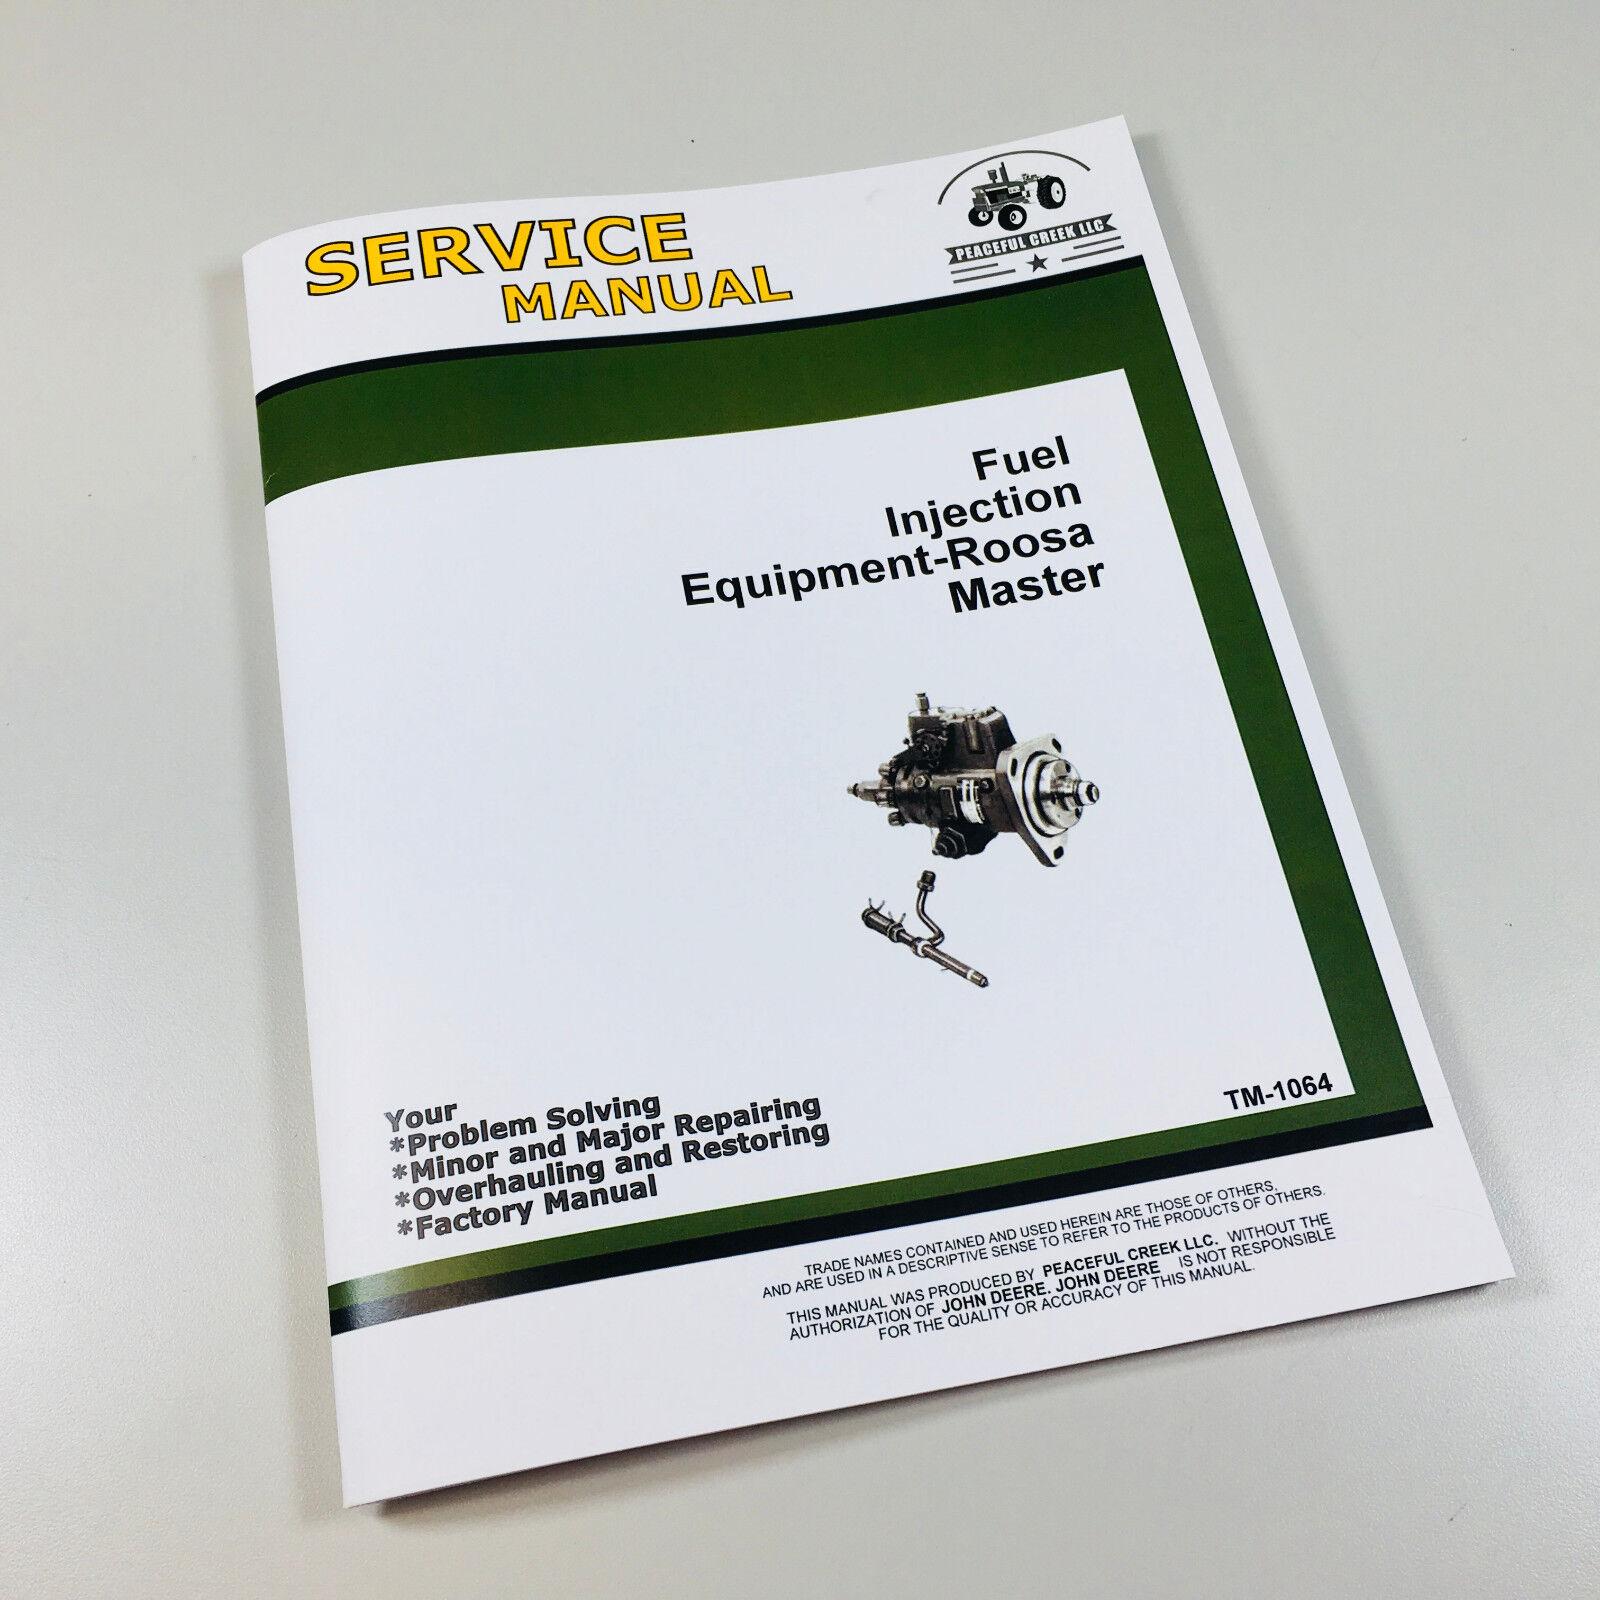 Details about FUEL INJECTION ROOSA MASTER DM2 PUMP TECH SERVICE MANUAL JOHN  DEERE 6404D ENGINE